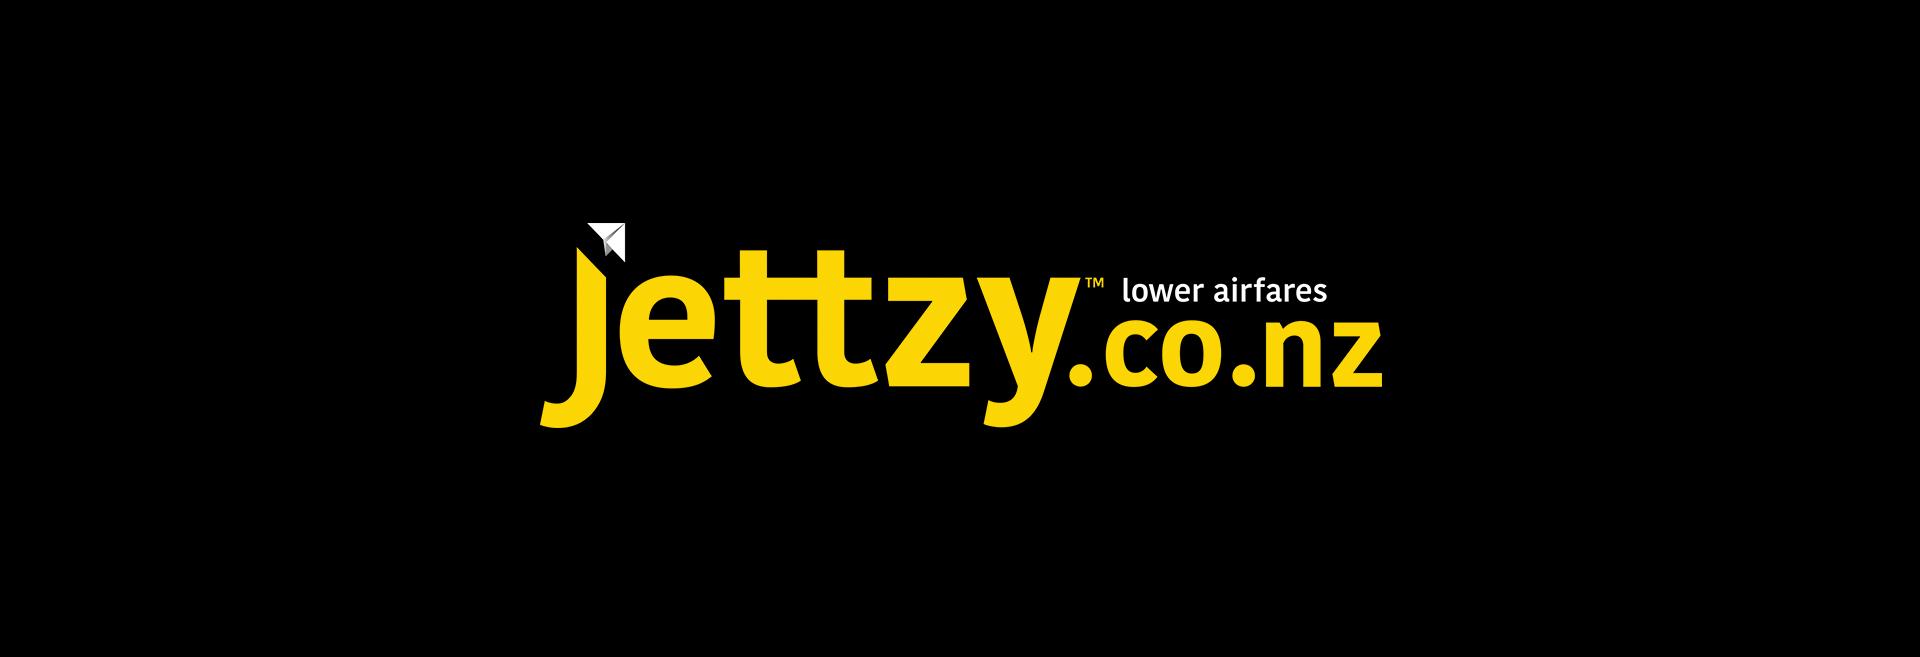 REDFIRE_branding_packaging_digital_design_Jettzy.co.nz_Logo_Level01